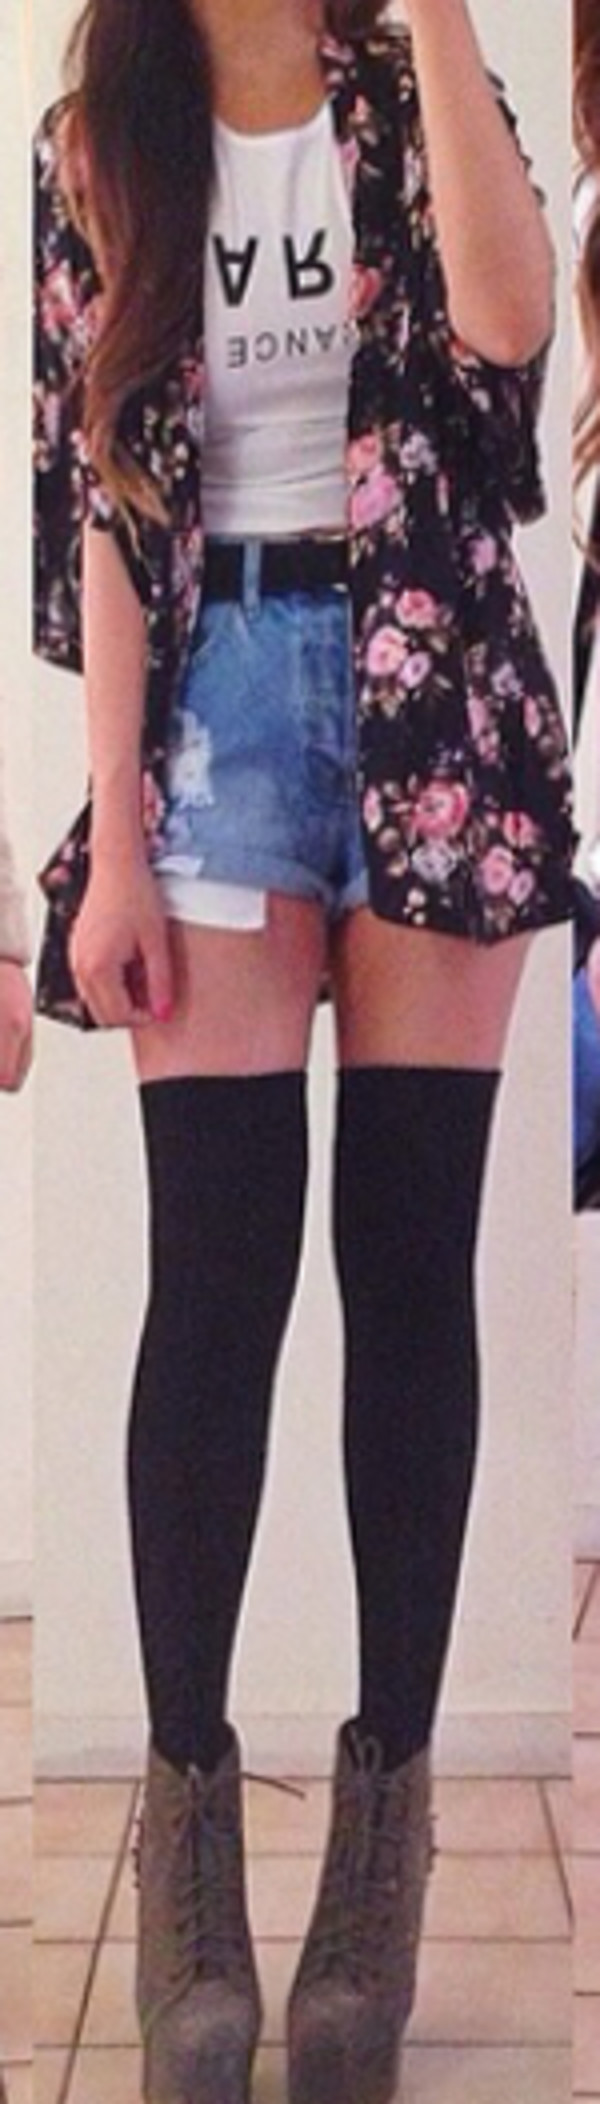 cardigan t-shirt shoes socks tights